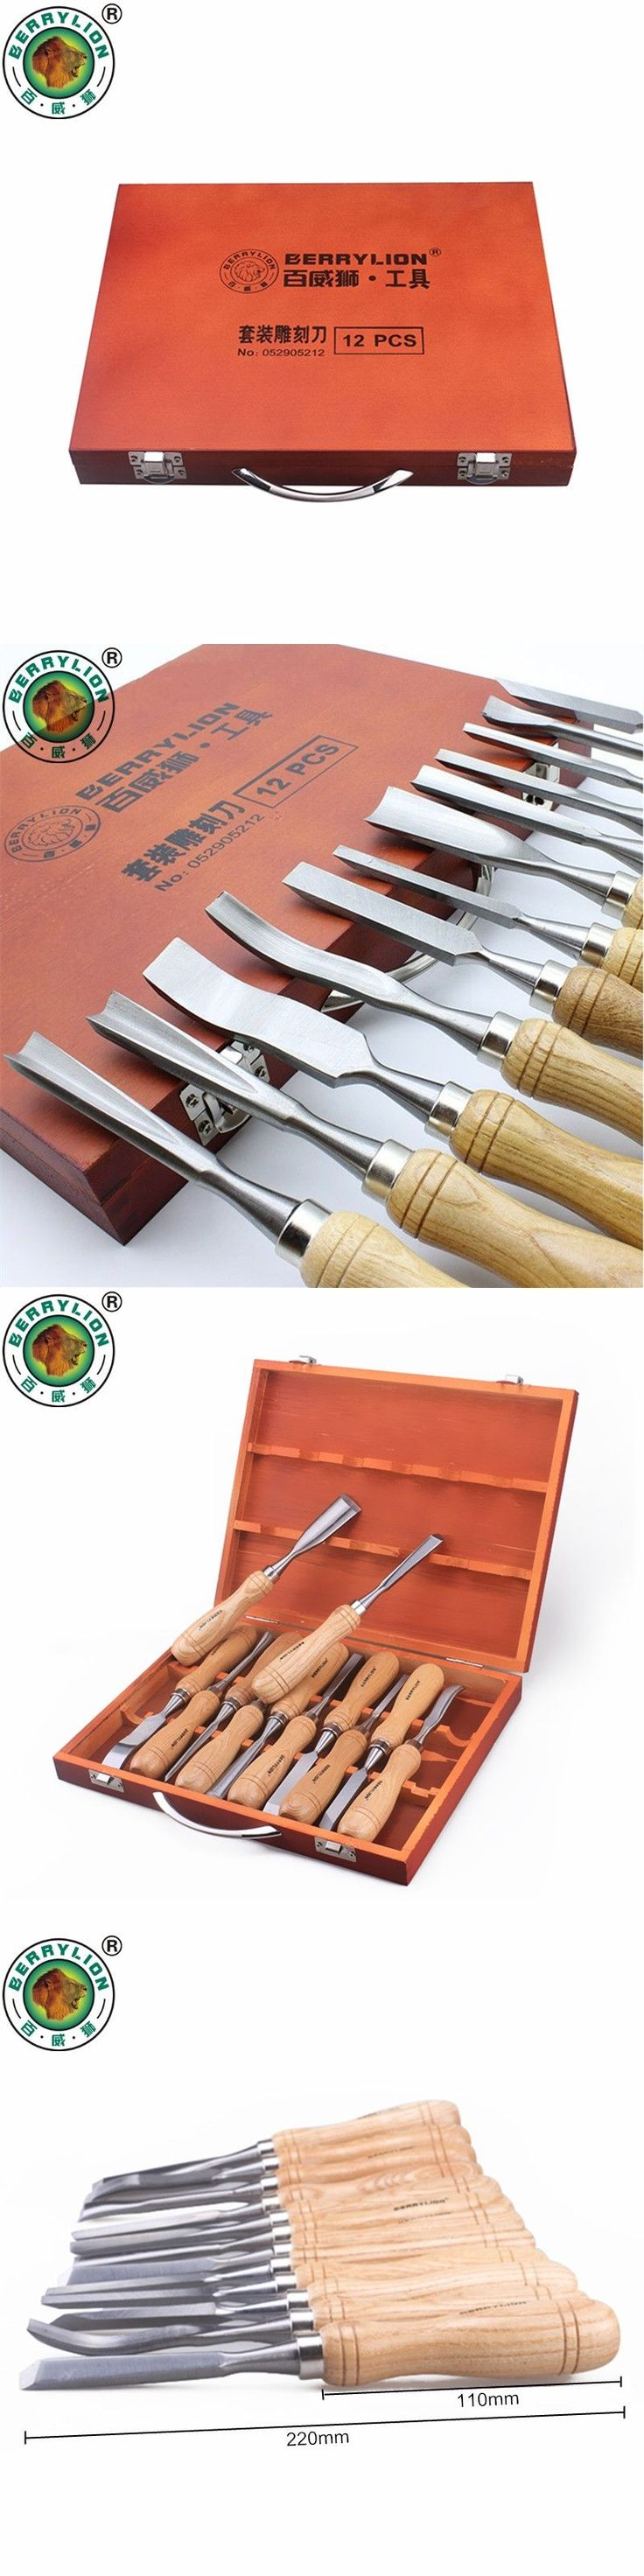 BERRYLION 12pcs Wood Carving Tools Set Wood Chisel Tools For Carving Wood Kit Wood Carving Knife Woodworking Hand Tools